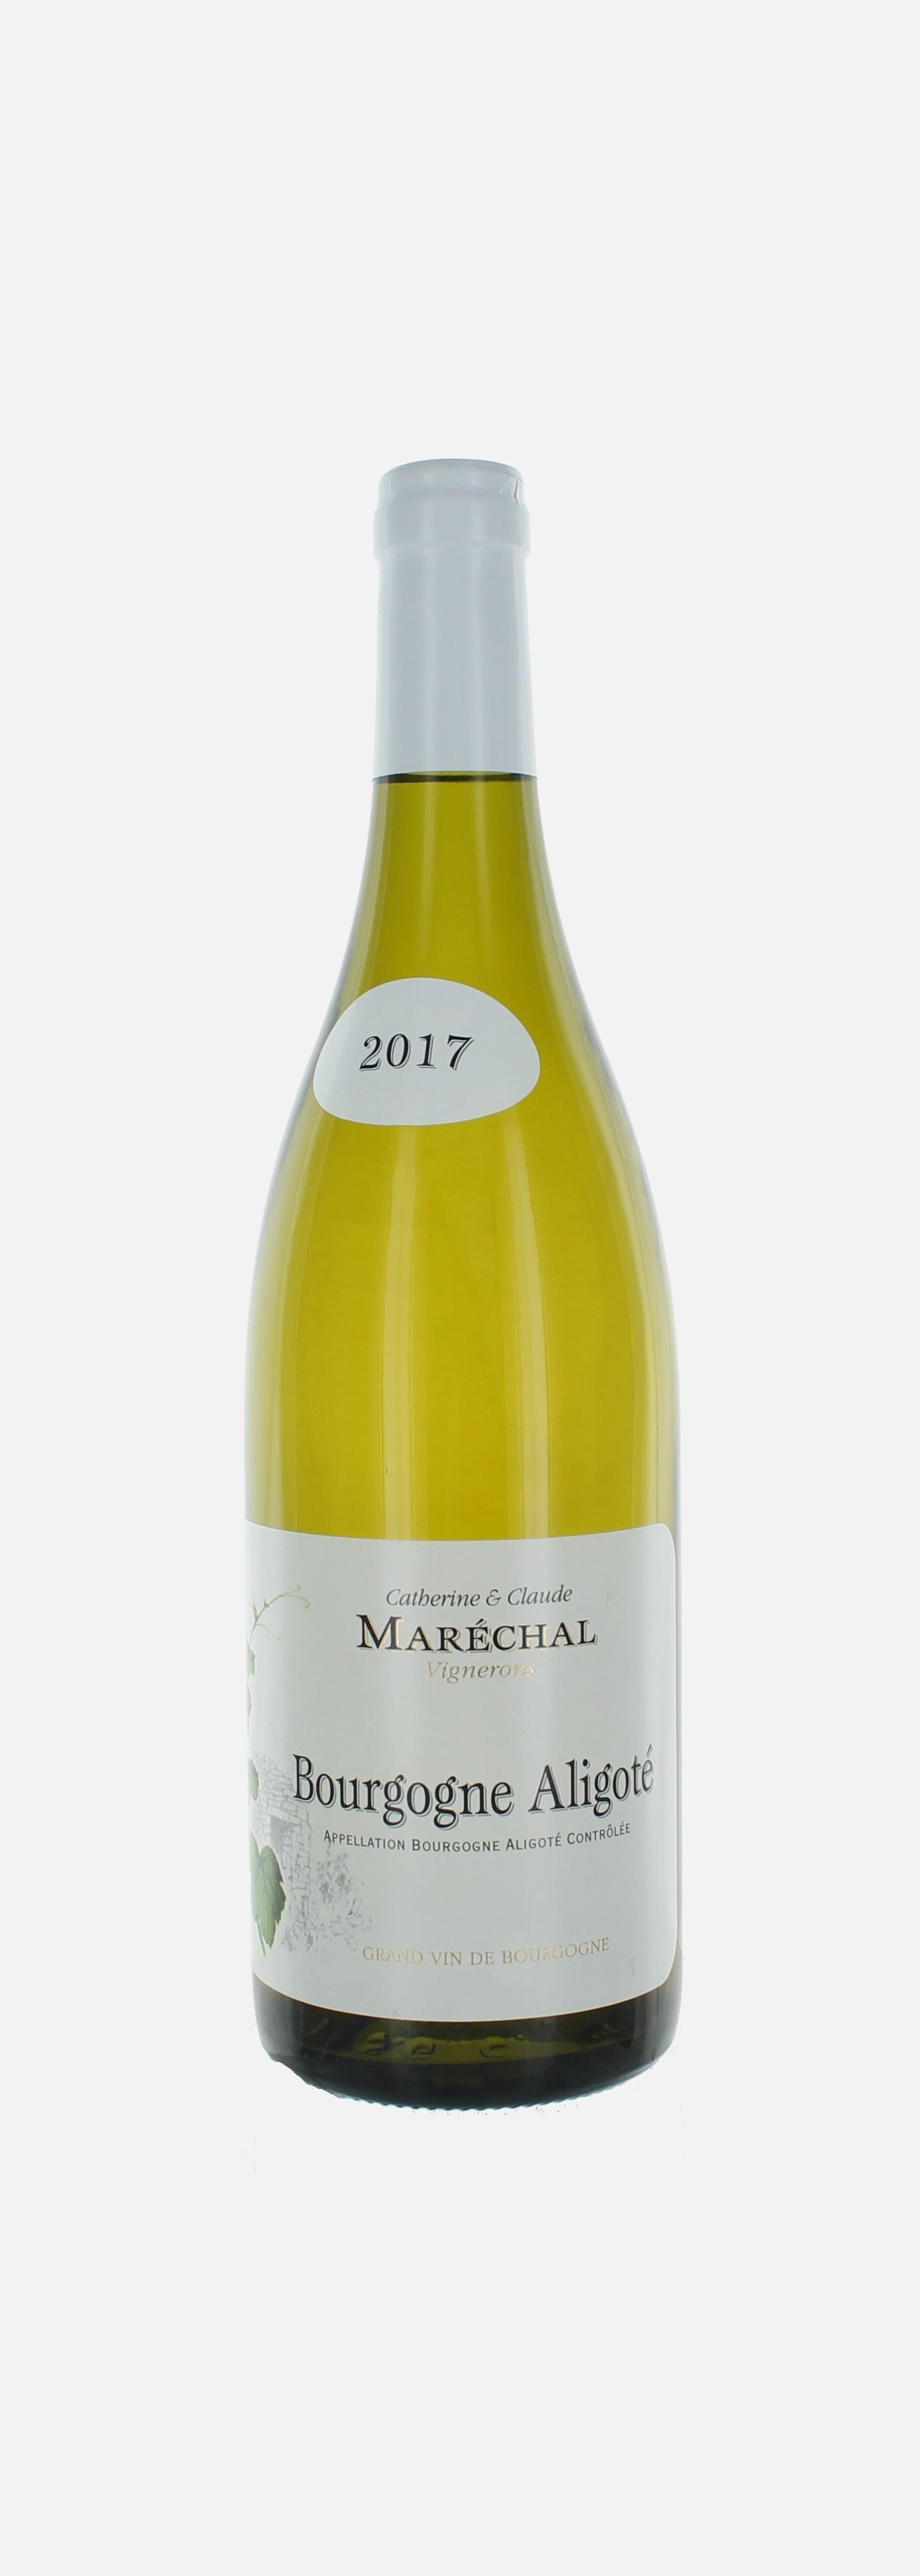 Bourgogne Aligoté, Maréchal